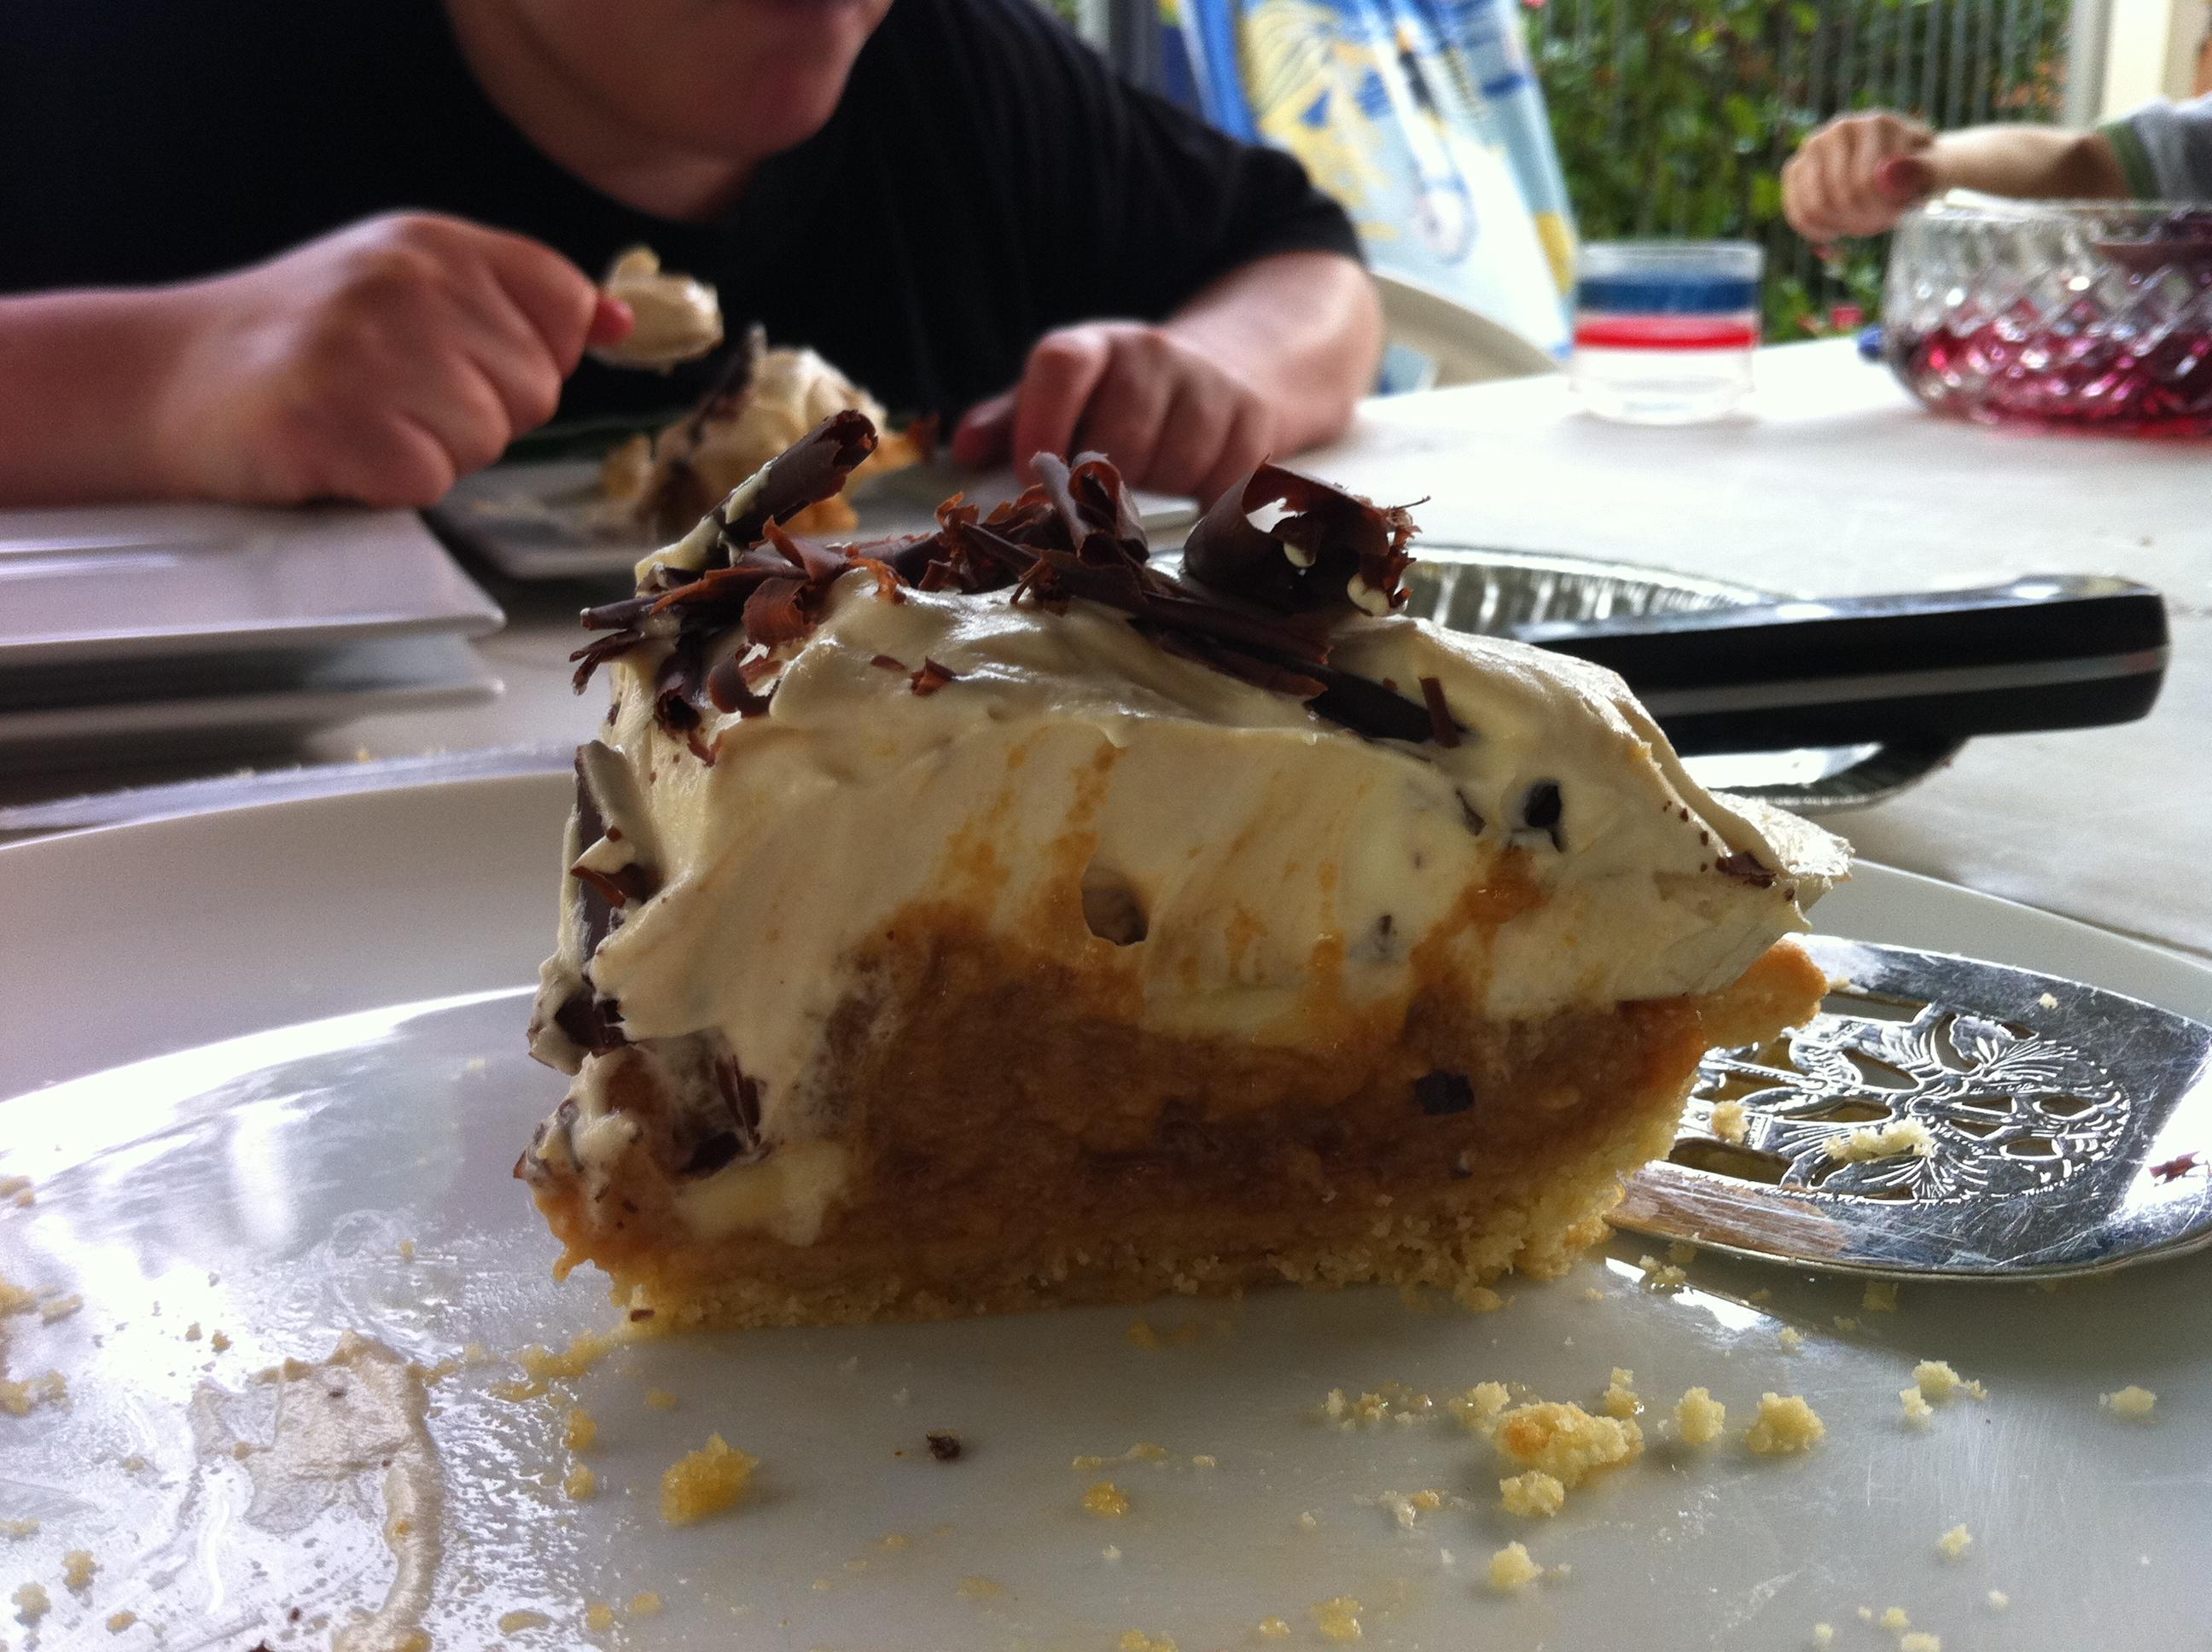 Fridge Cake Recipe Jamie Oliver: Jamie Oliver's 30-minute Meal Banoffee Pie